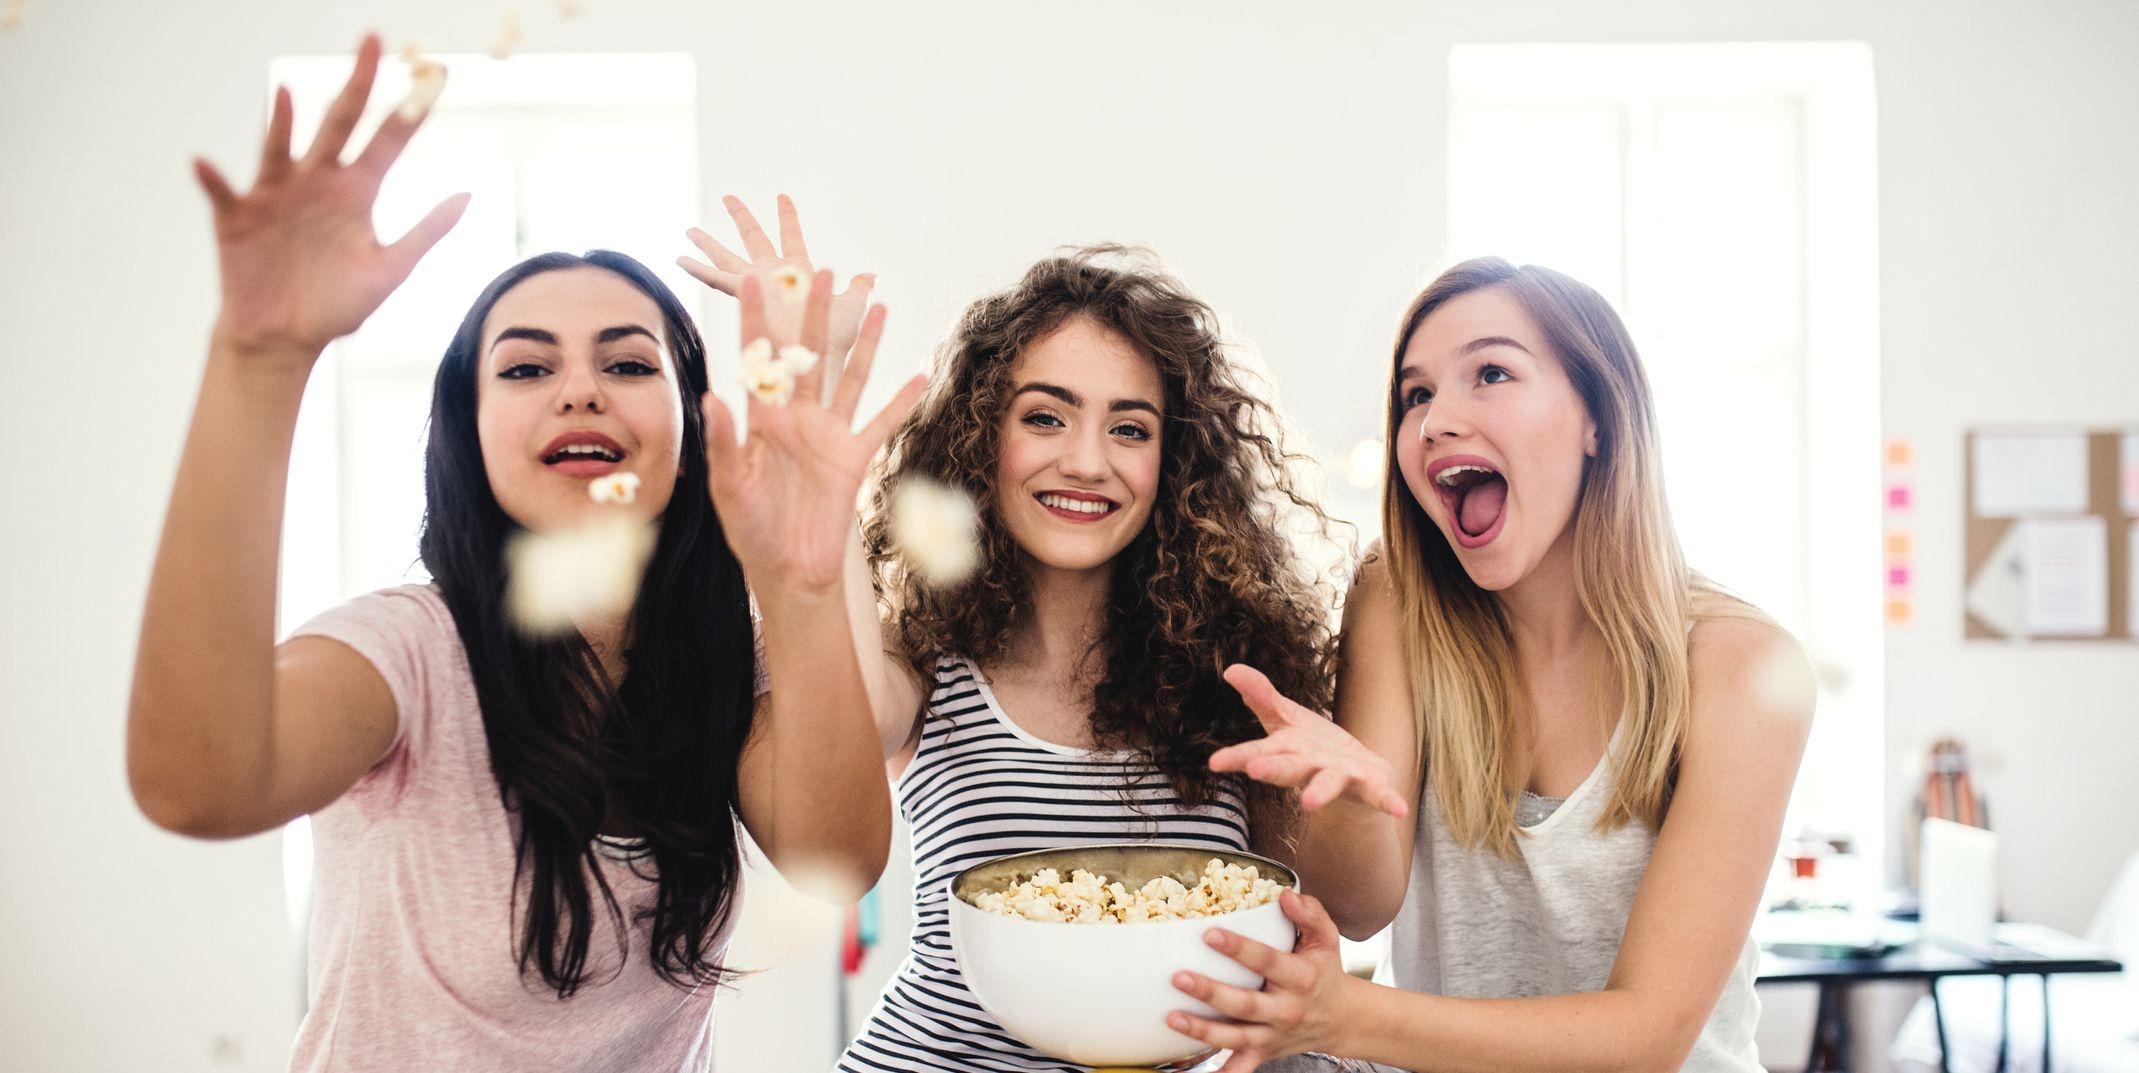 Three female teenager friends eating popcorn at home, having fun.